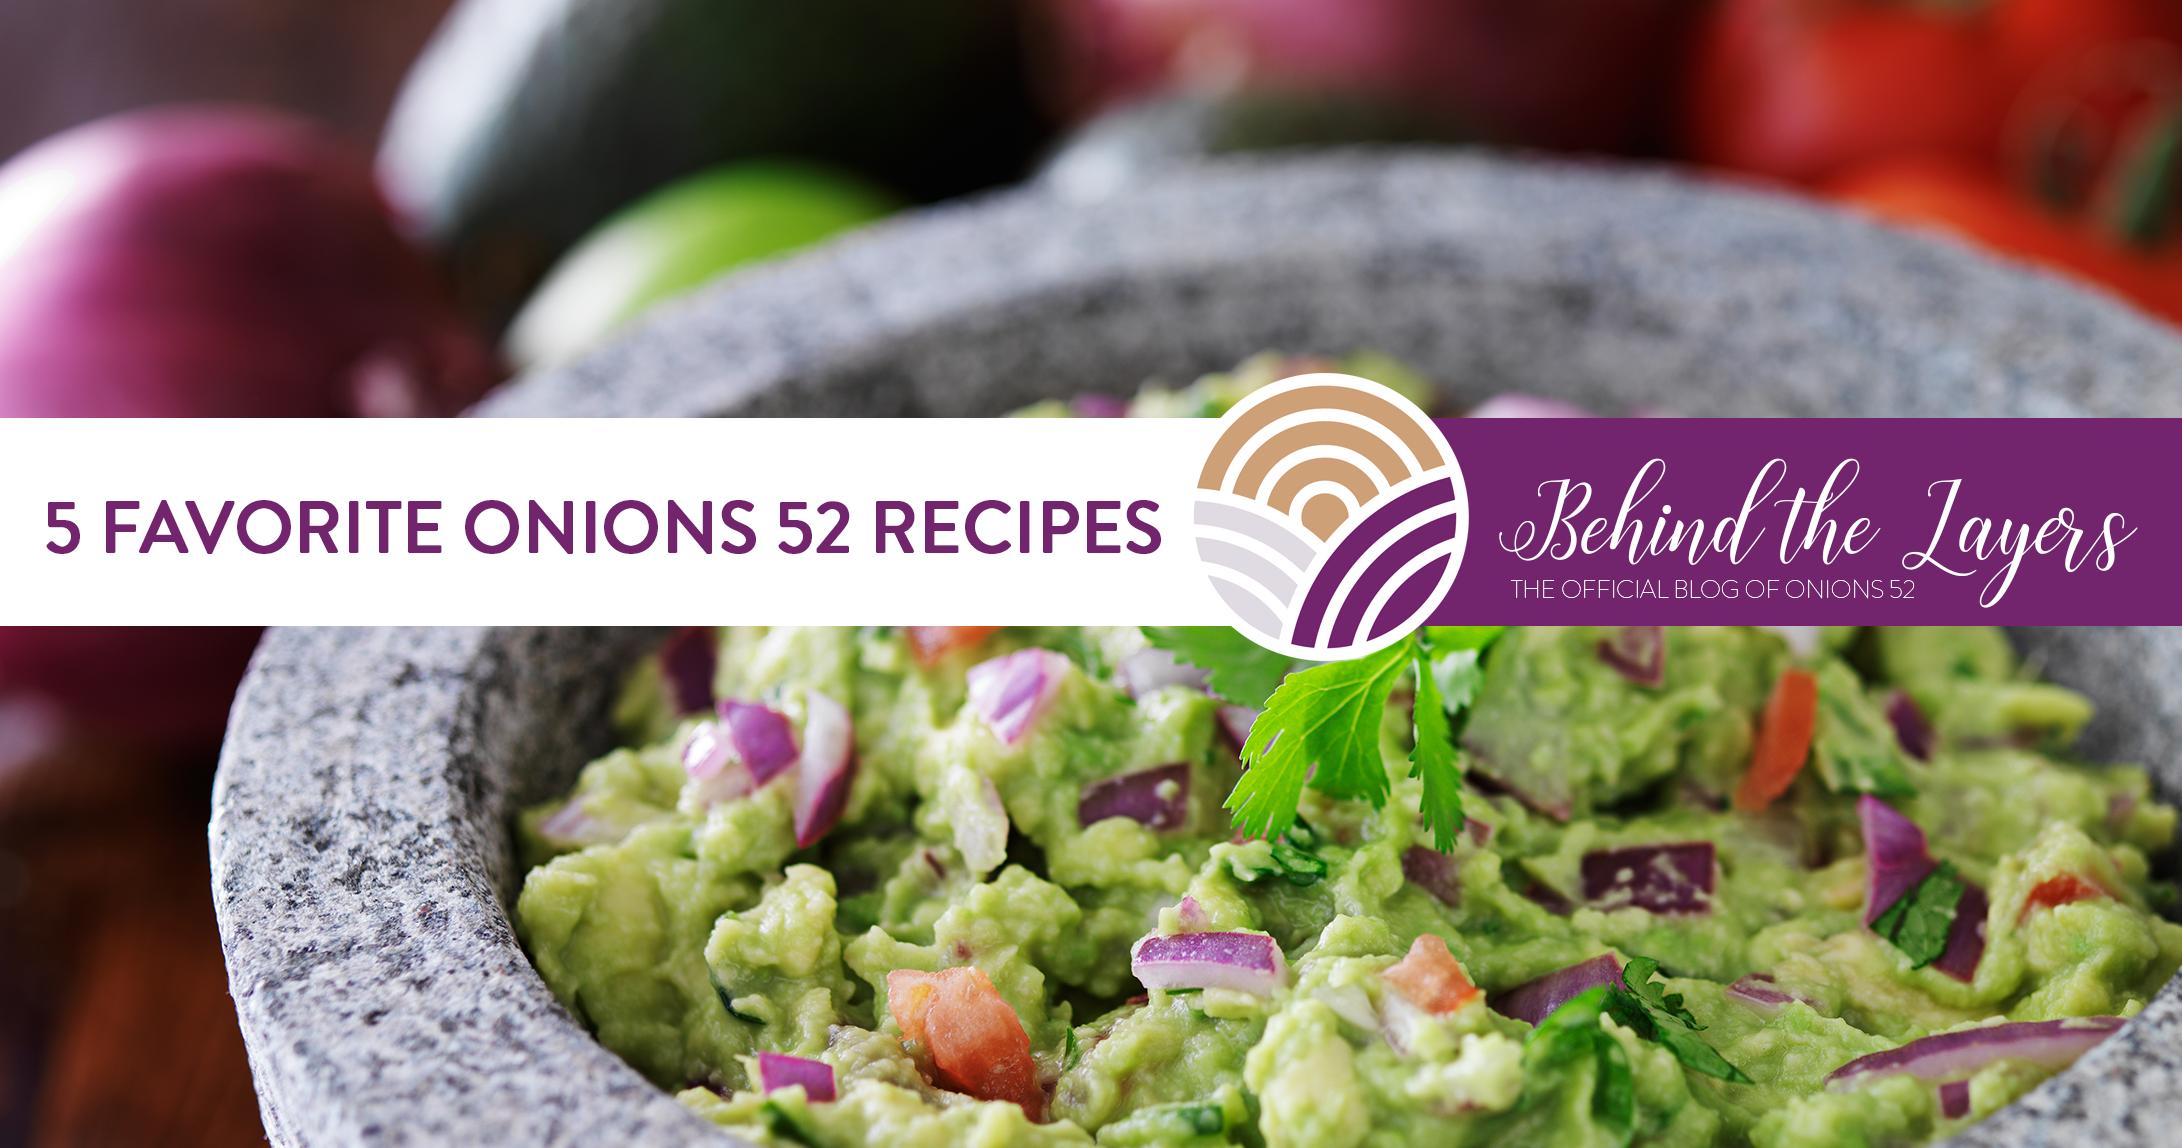 5 Favorite Onions 52 Recipes